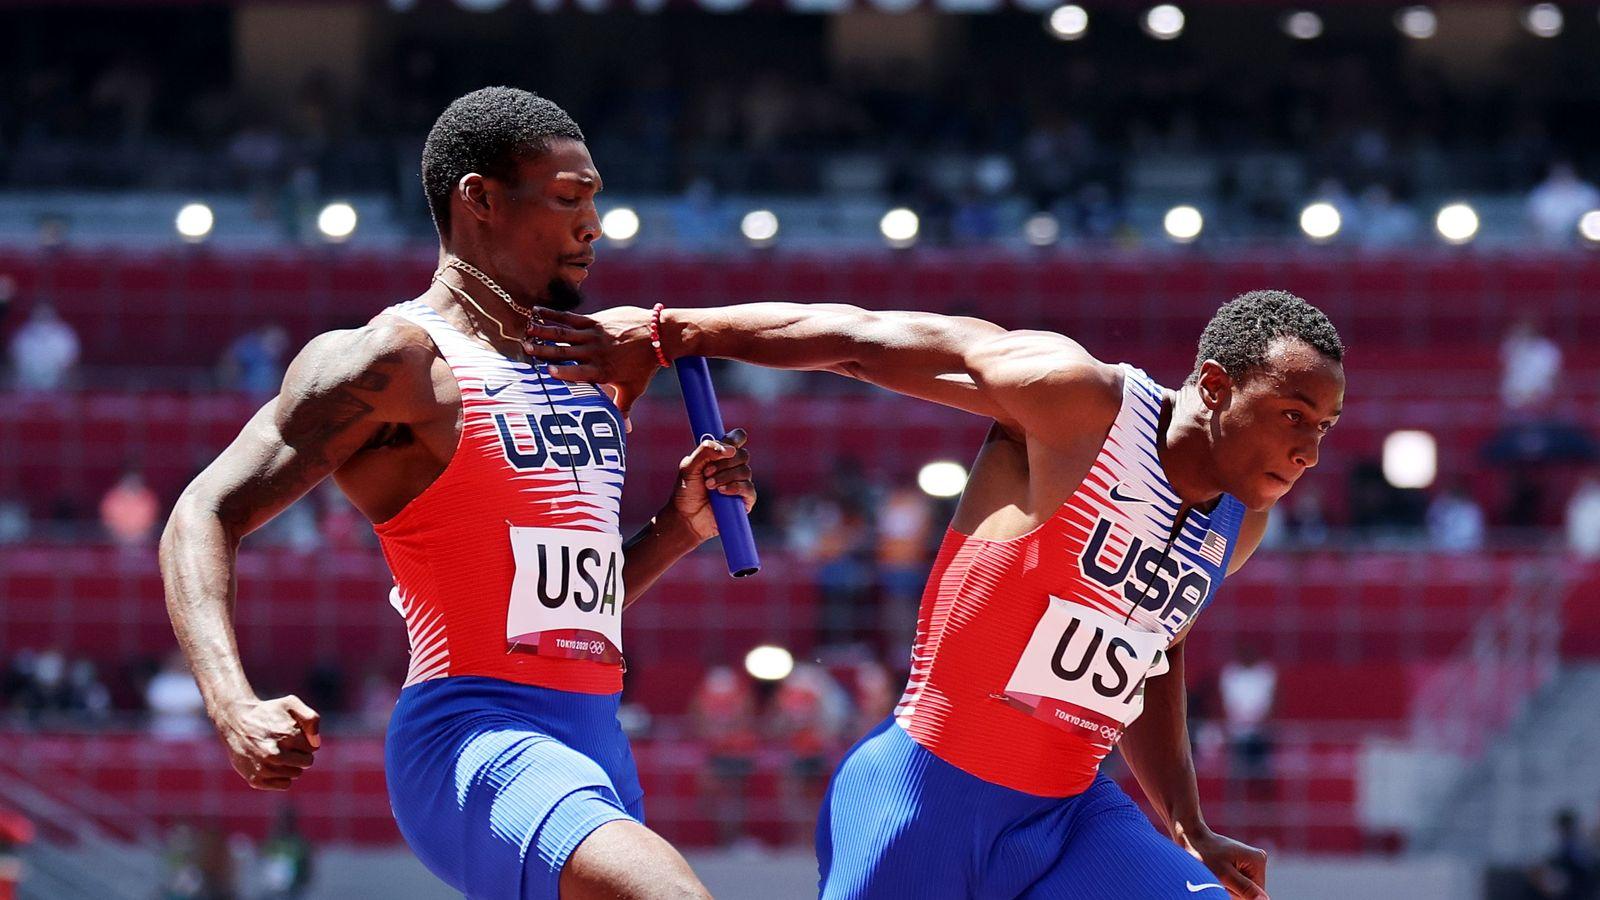 Tokyo Olympics: Carl Lewis blasts US men's 4x100m relay performance as 'total embarrassment'